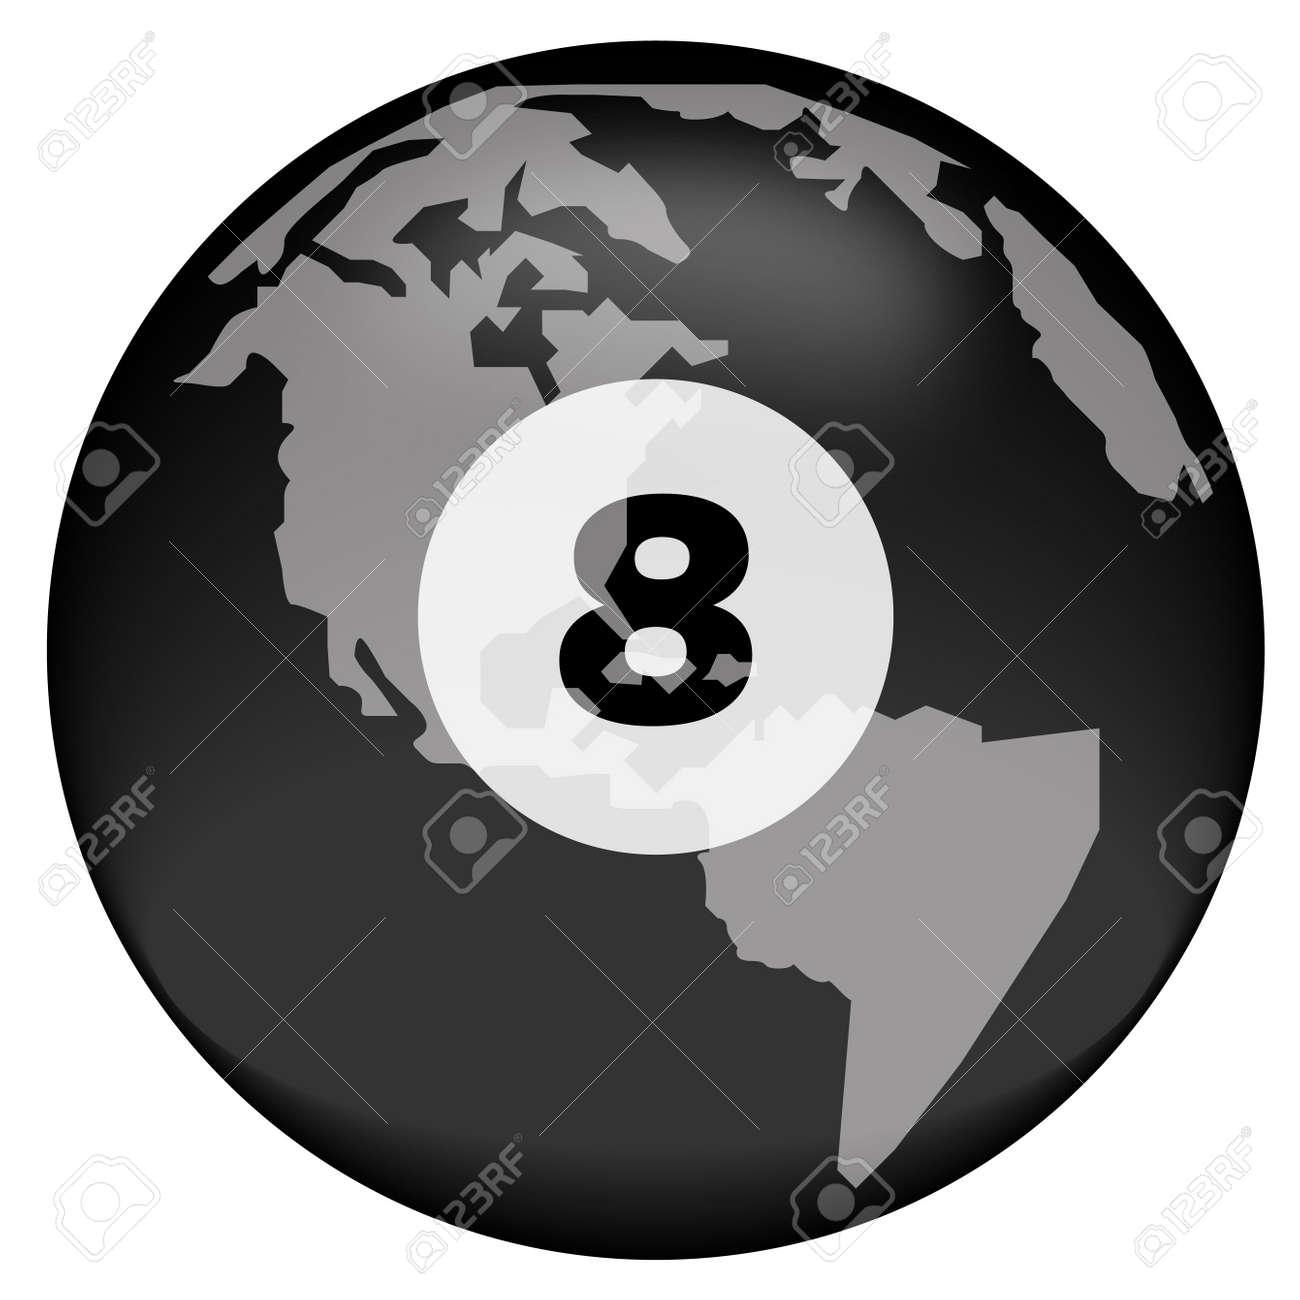 earth or globe with eight ball overlay - vector Stock Photo - 2930911